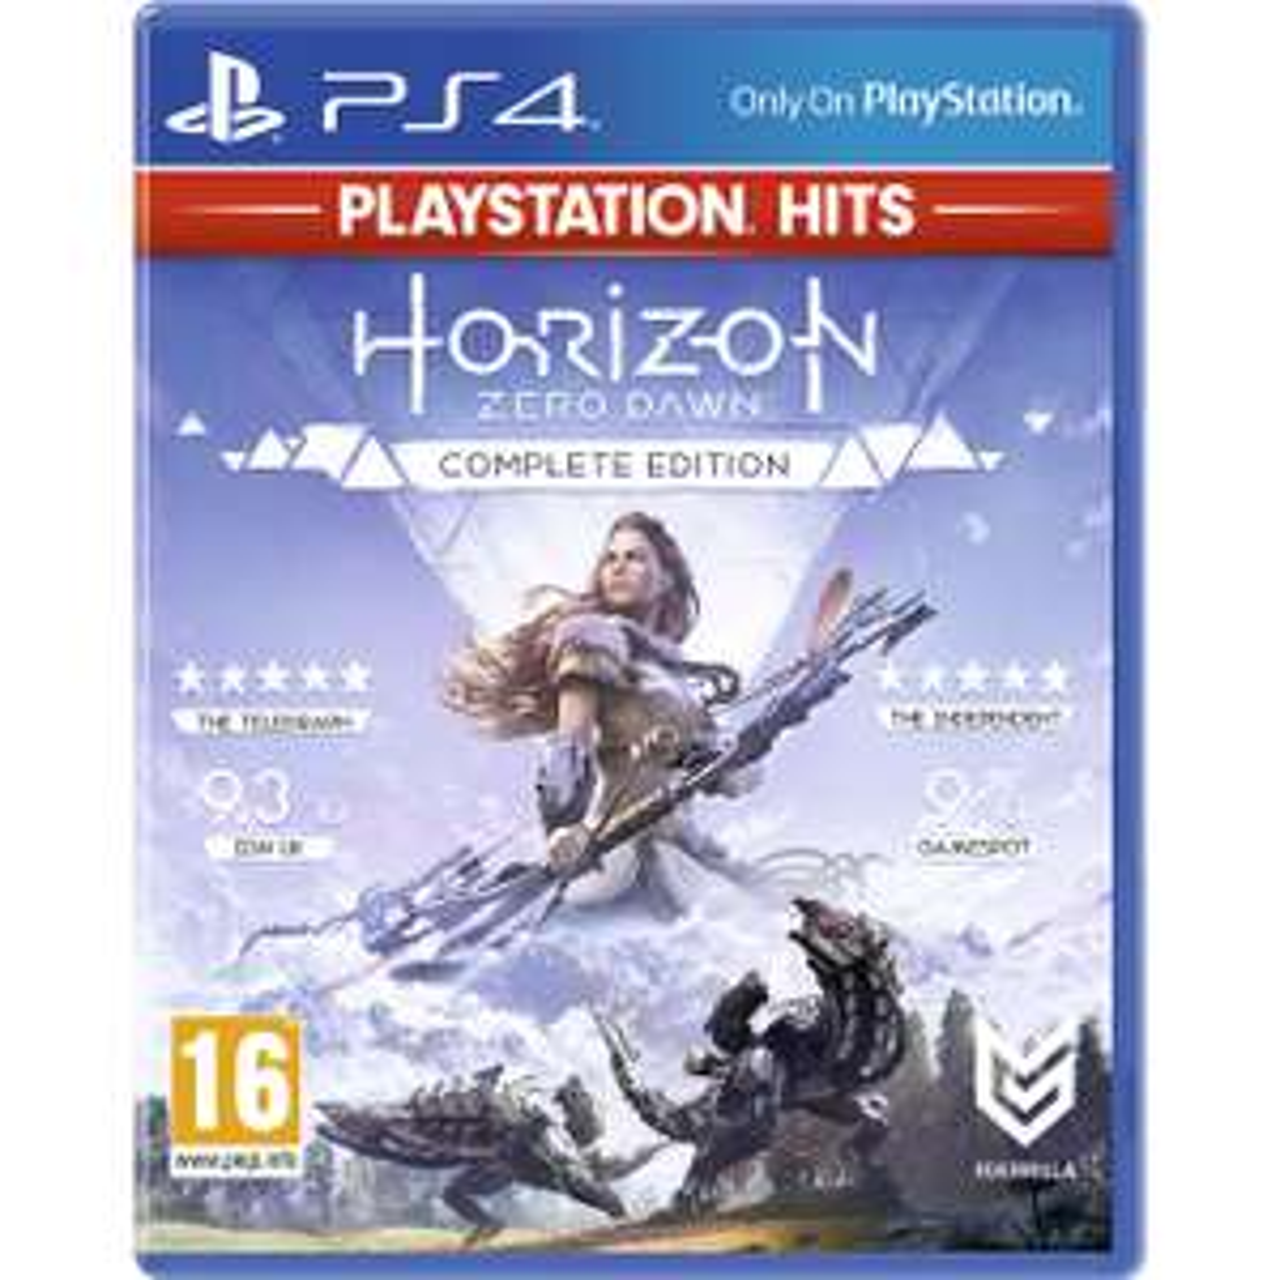 Horizon Zero Dawn: Complete Edition (PS4), £9 at AO